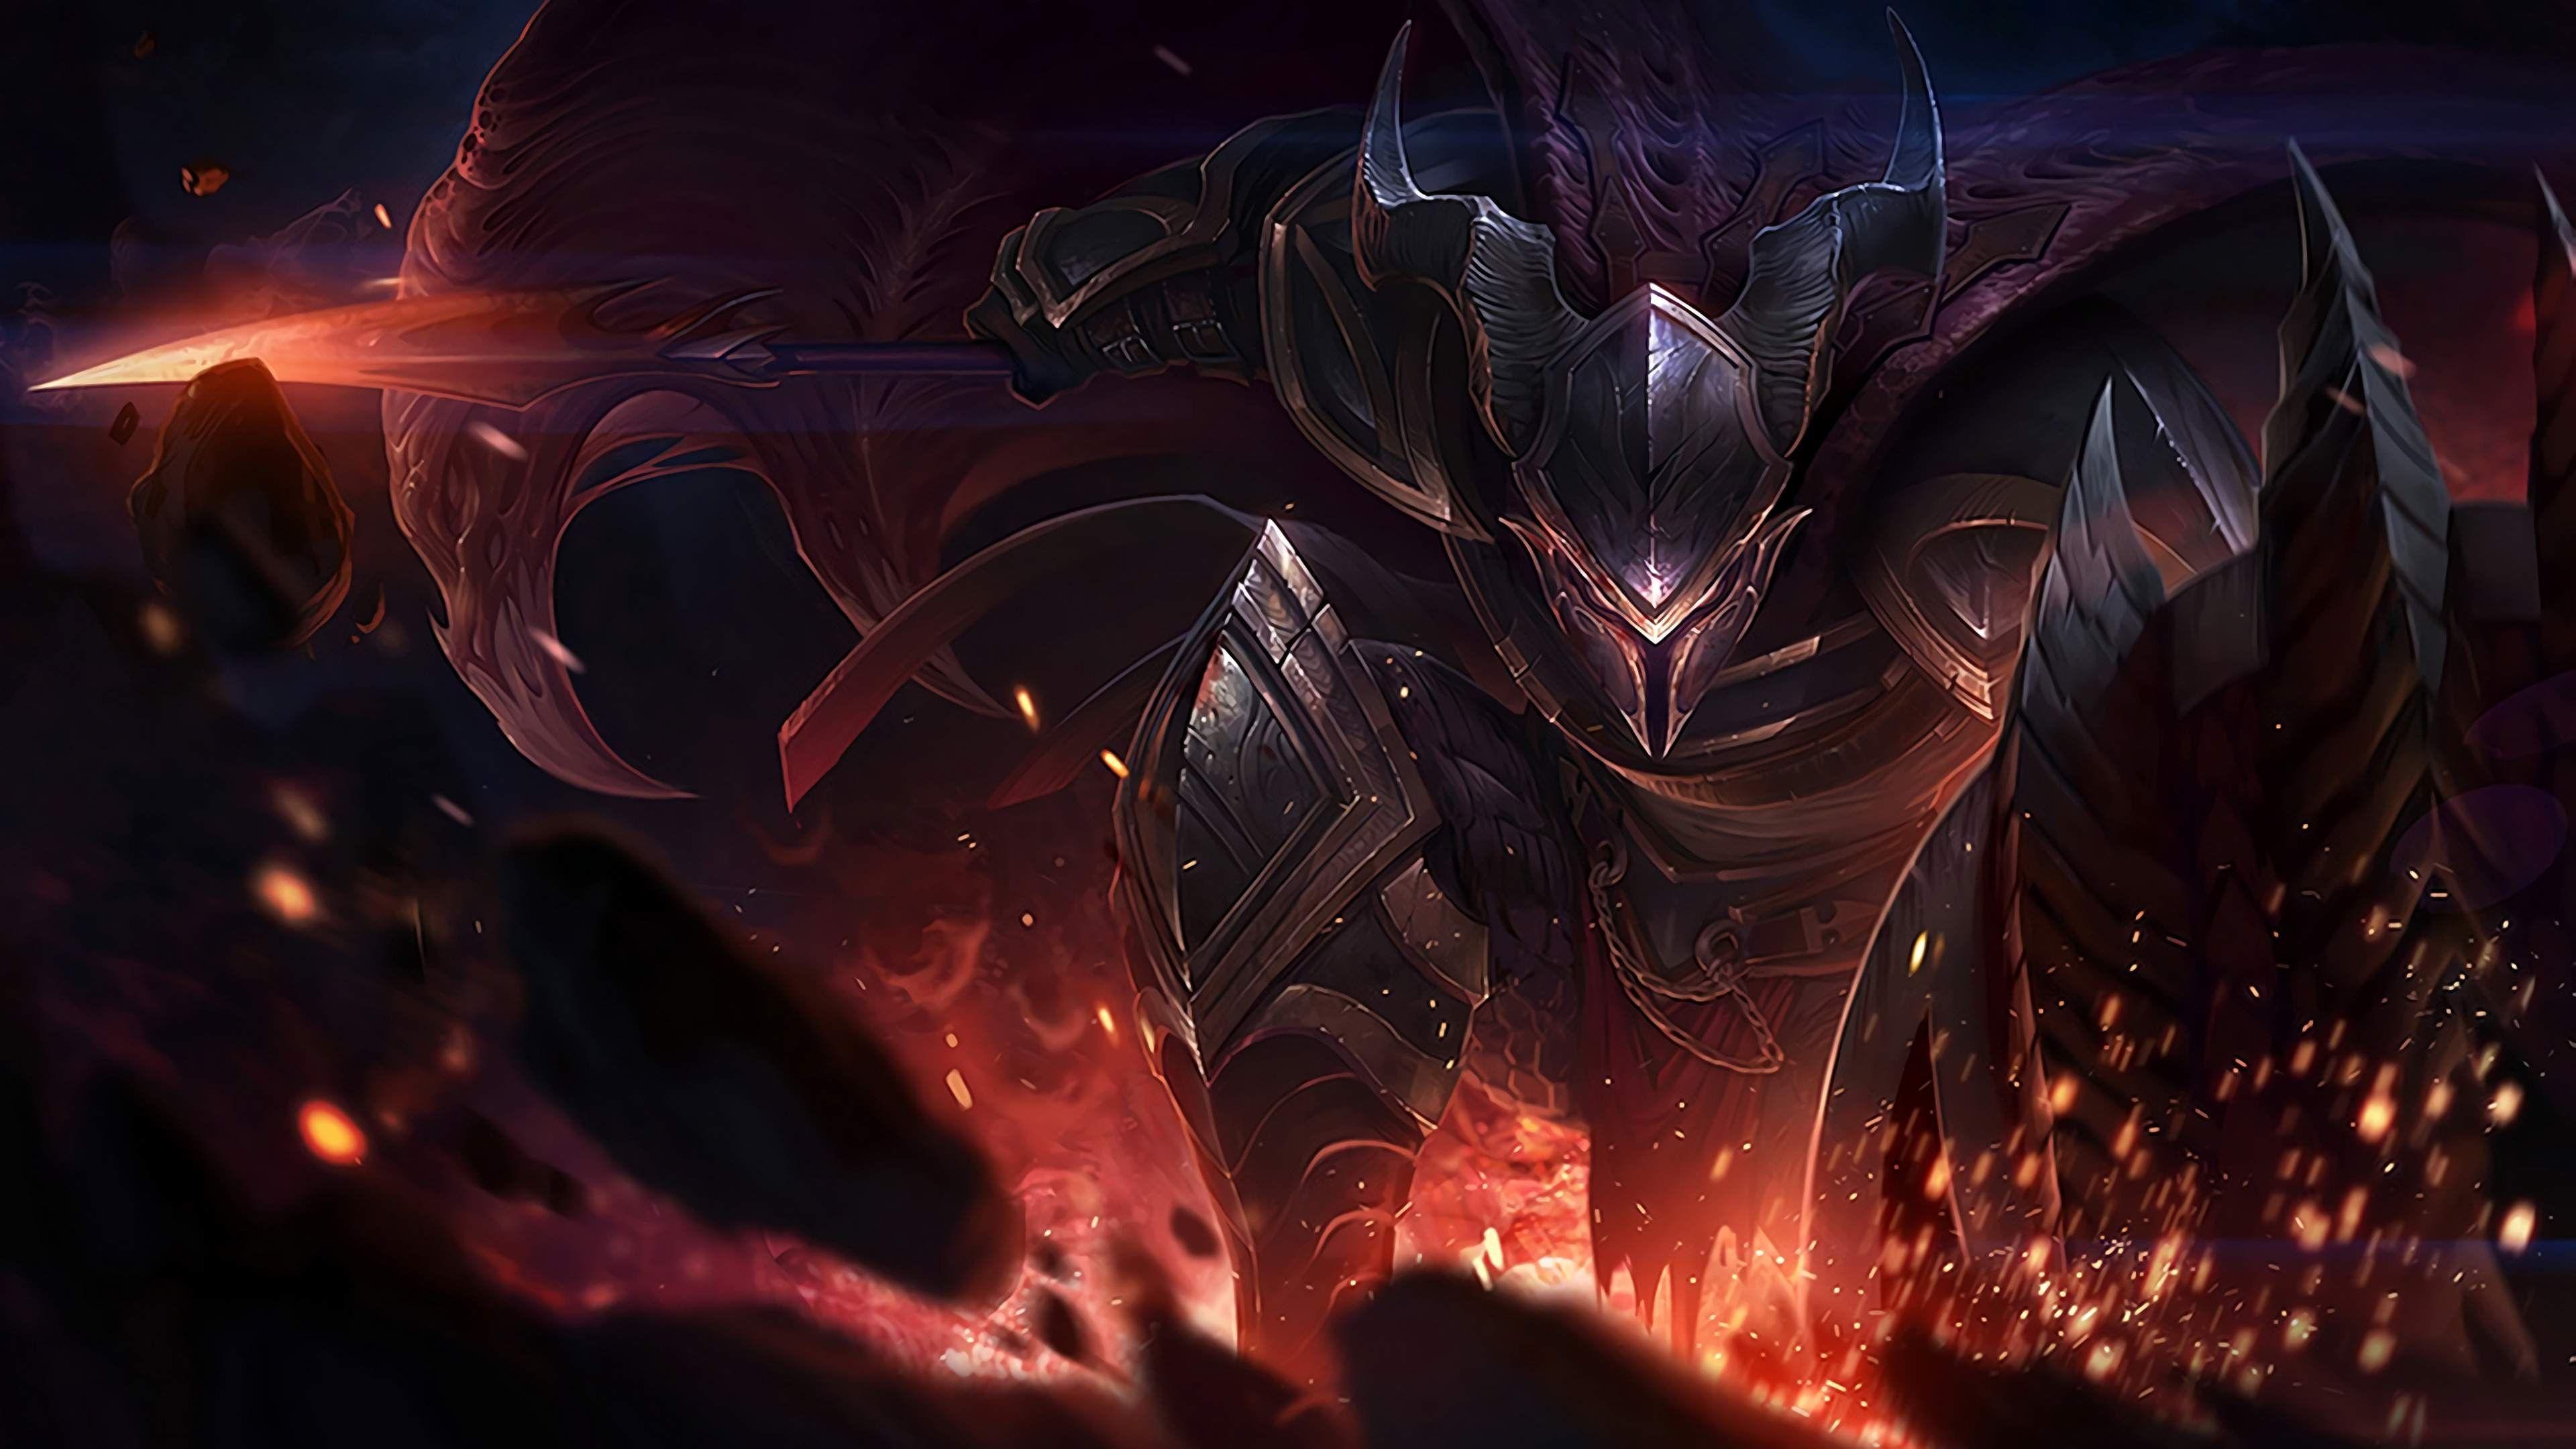 Game Lol Ultra Hd 4k Ultra Hd Wallpaper Pantheon League Of Legends Lol League Of Legends League Of Legends